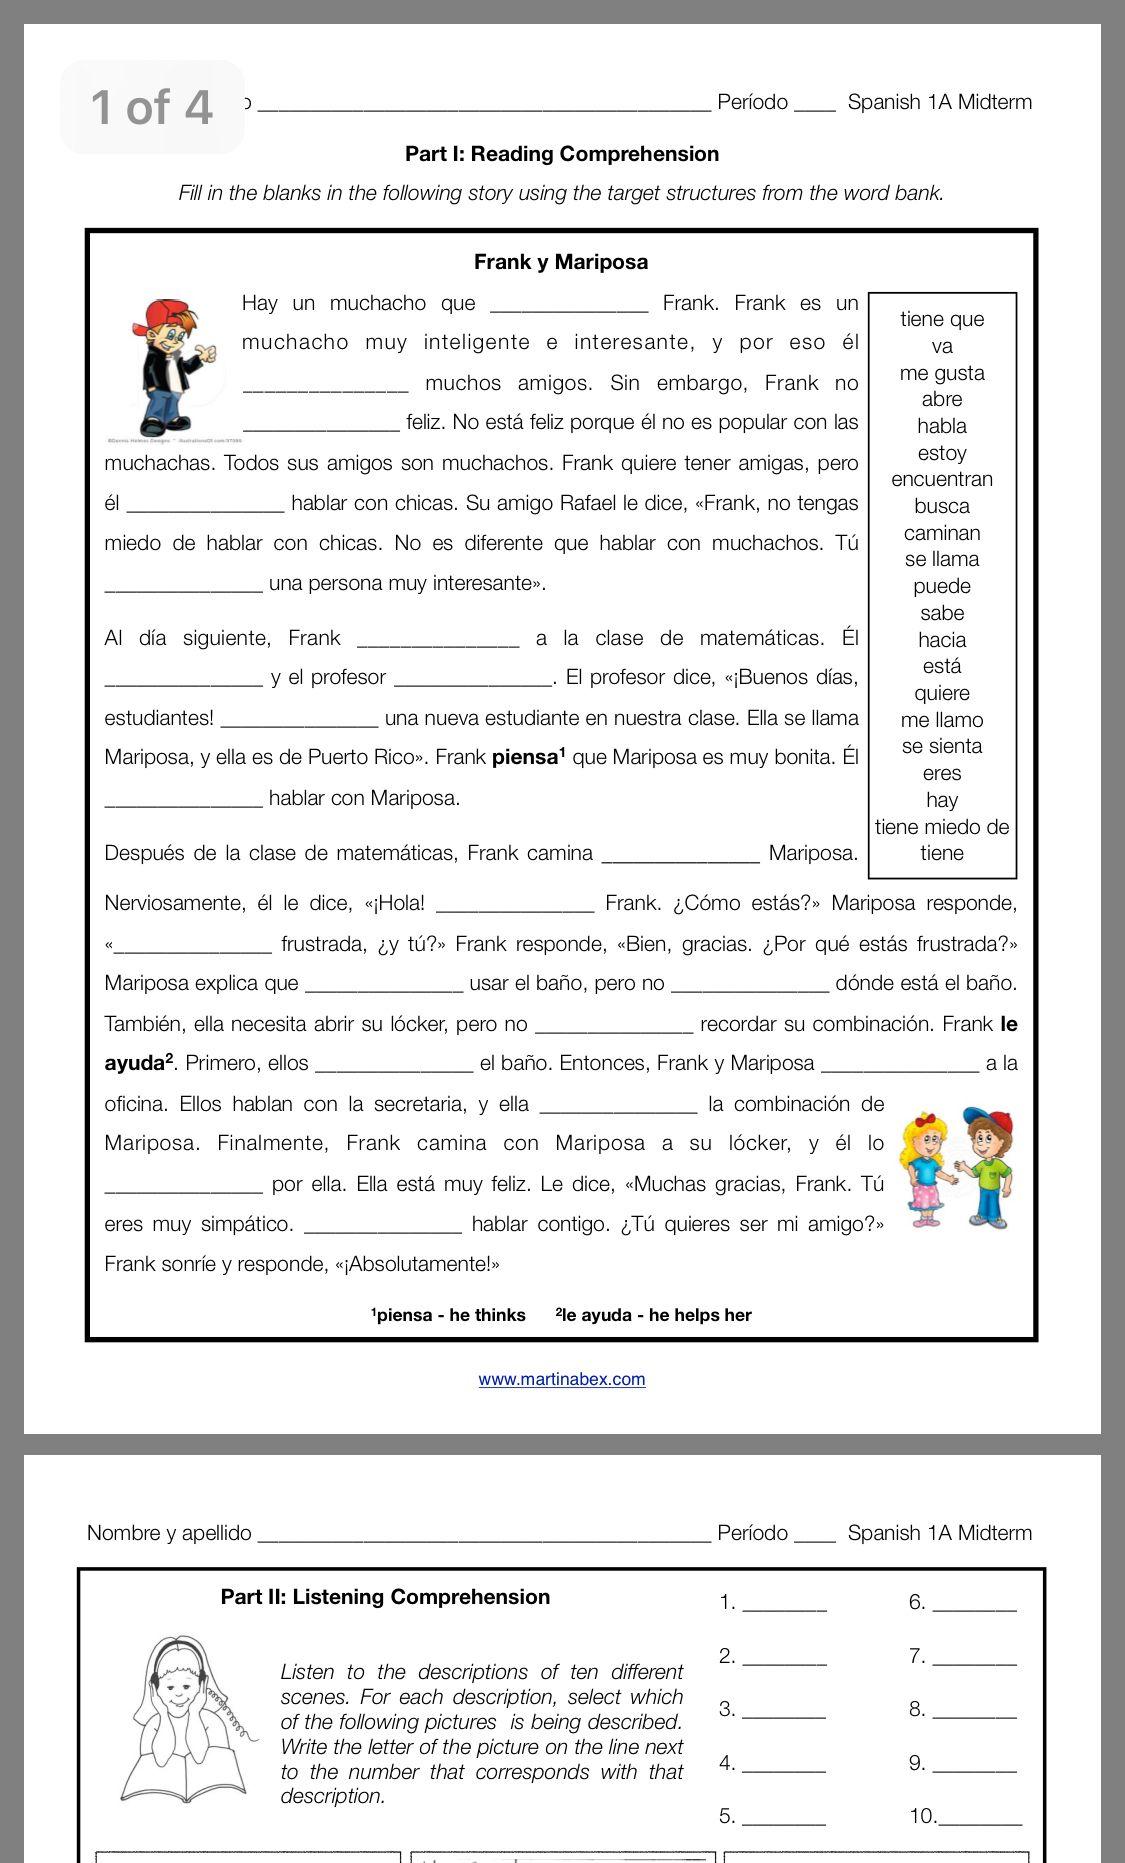 Pin By Trisha Peckosh On Spanish Spanish Reading Comprehension Spanish Reading Word Bank [ 1863 x 1125 Pixel ]